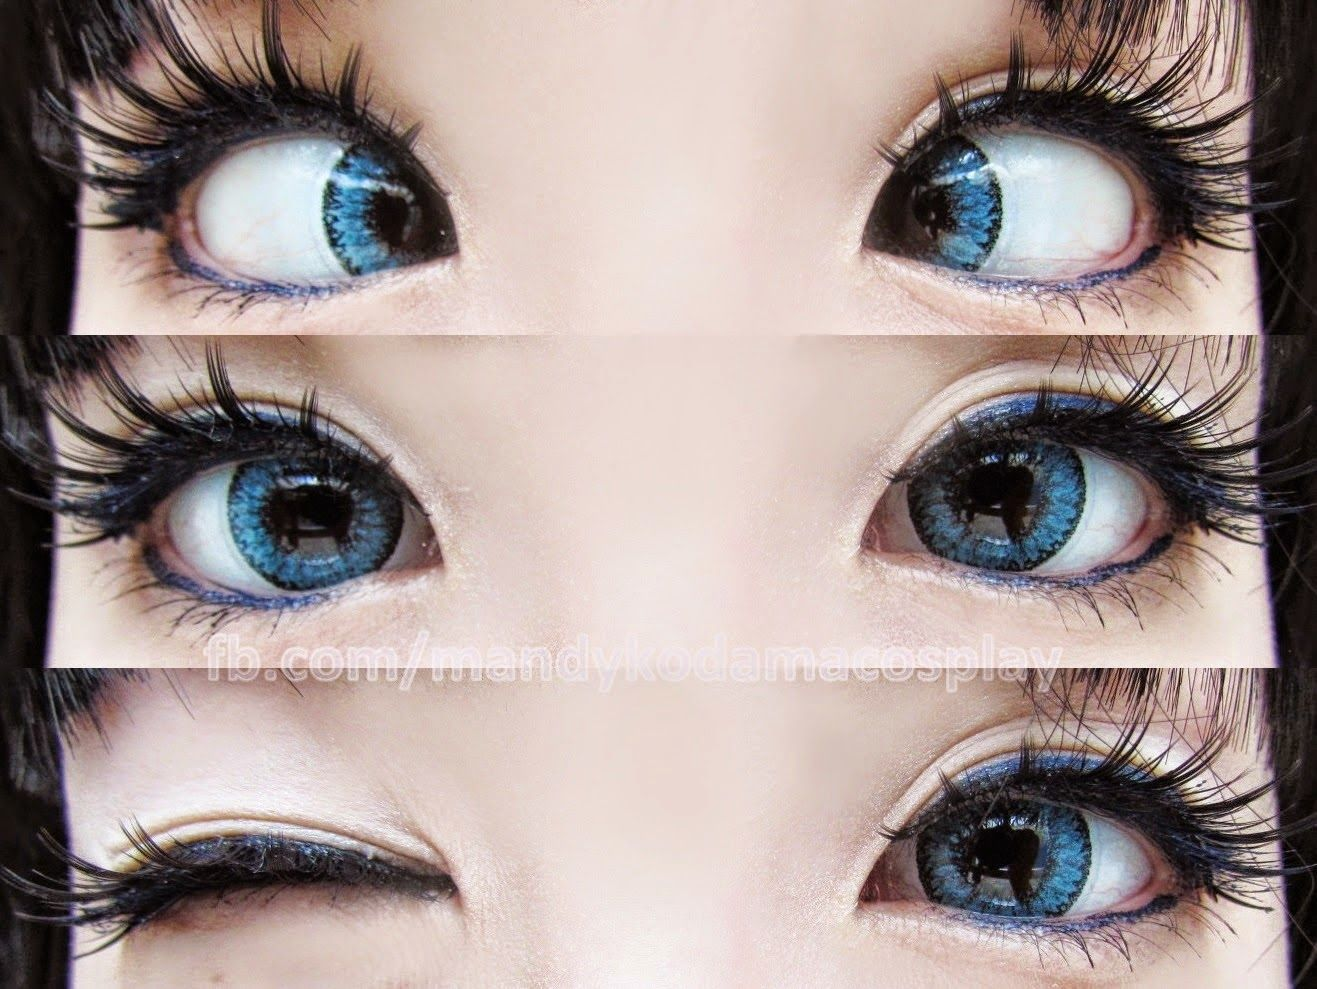 Eos fay blue circle lenses are translucent blue circle